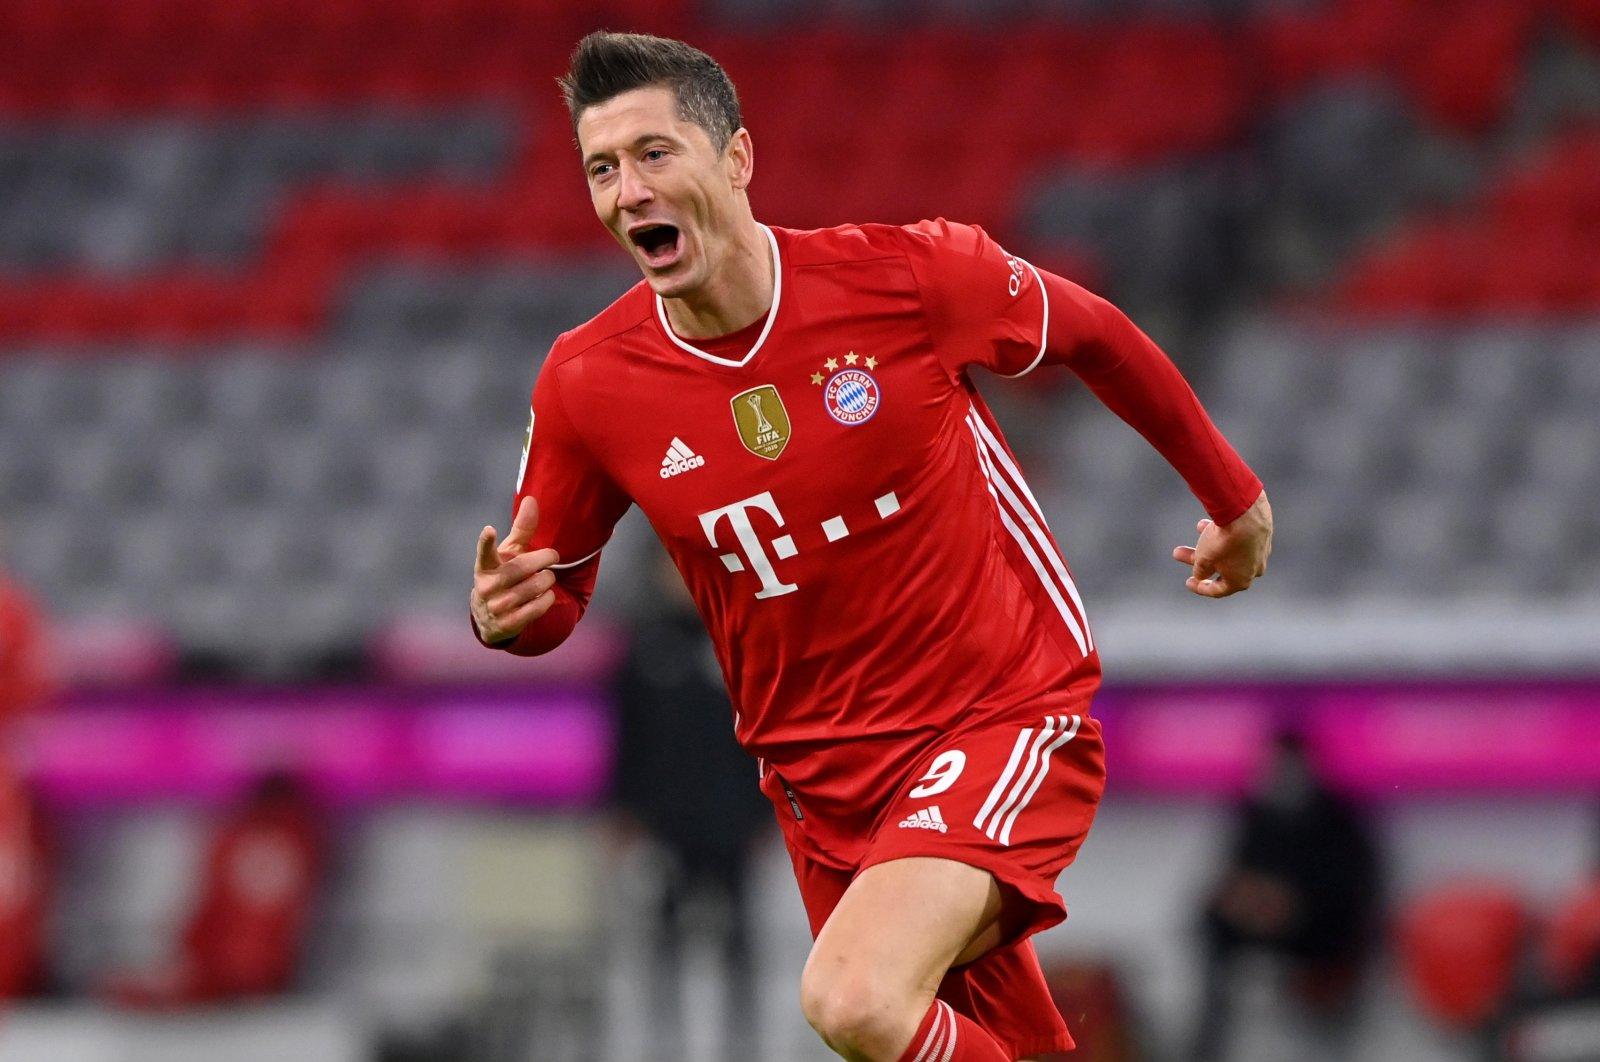 Bayern Munich forward Robert Lewandowski celebrates after scoring a goal against Borussia Dortmund at the Allianz Arena, Munich, Germany, March06, 2021. (EPA Photo)